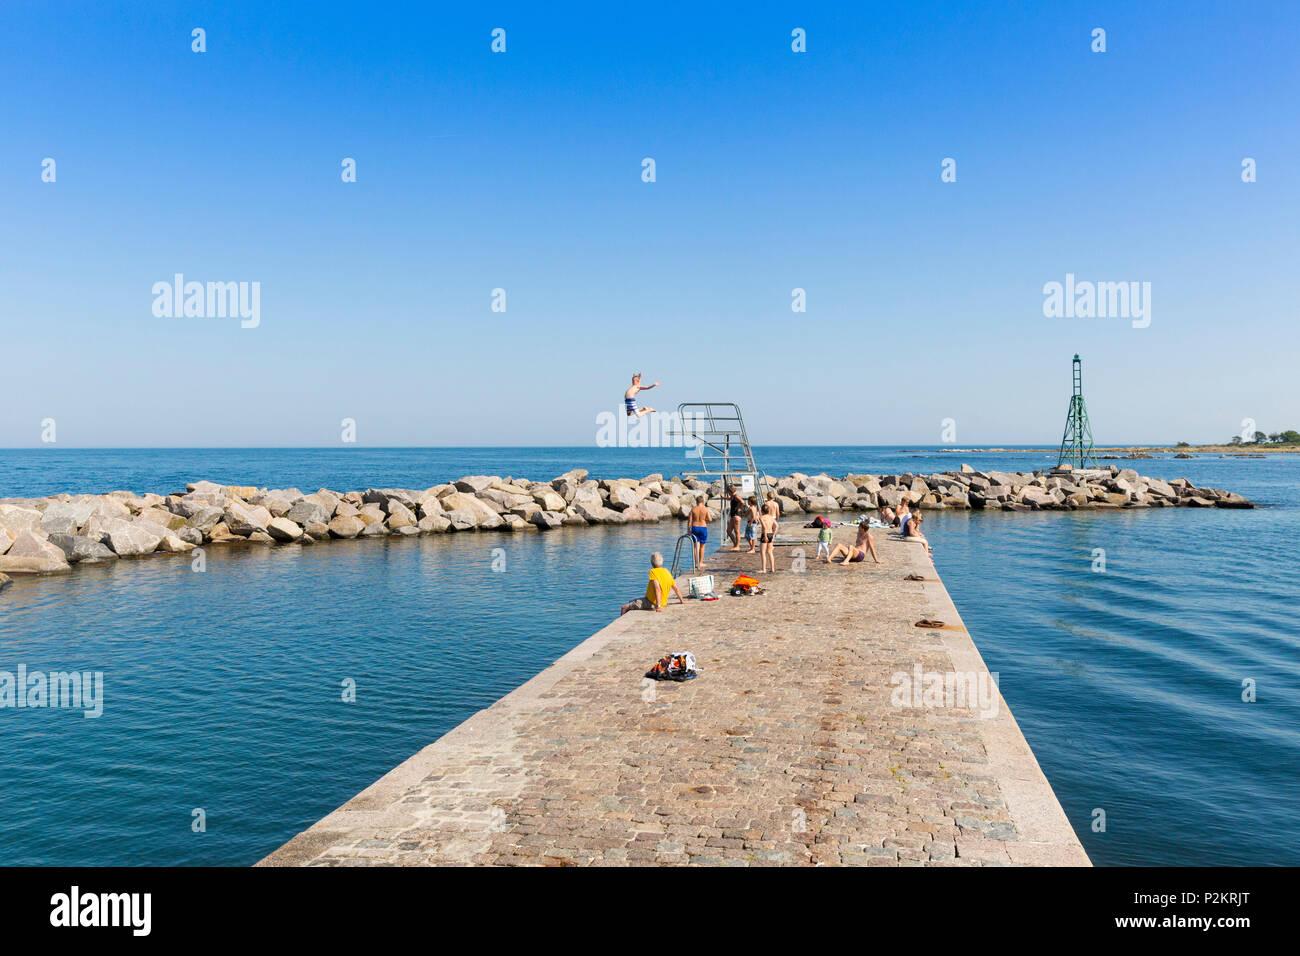 hildren at the diving platform, 5 meter tower at the harbour, summer, Baltic sea, Bornholm, Svaneke, Denmark, Europe - Stock Image